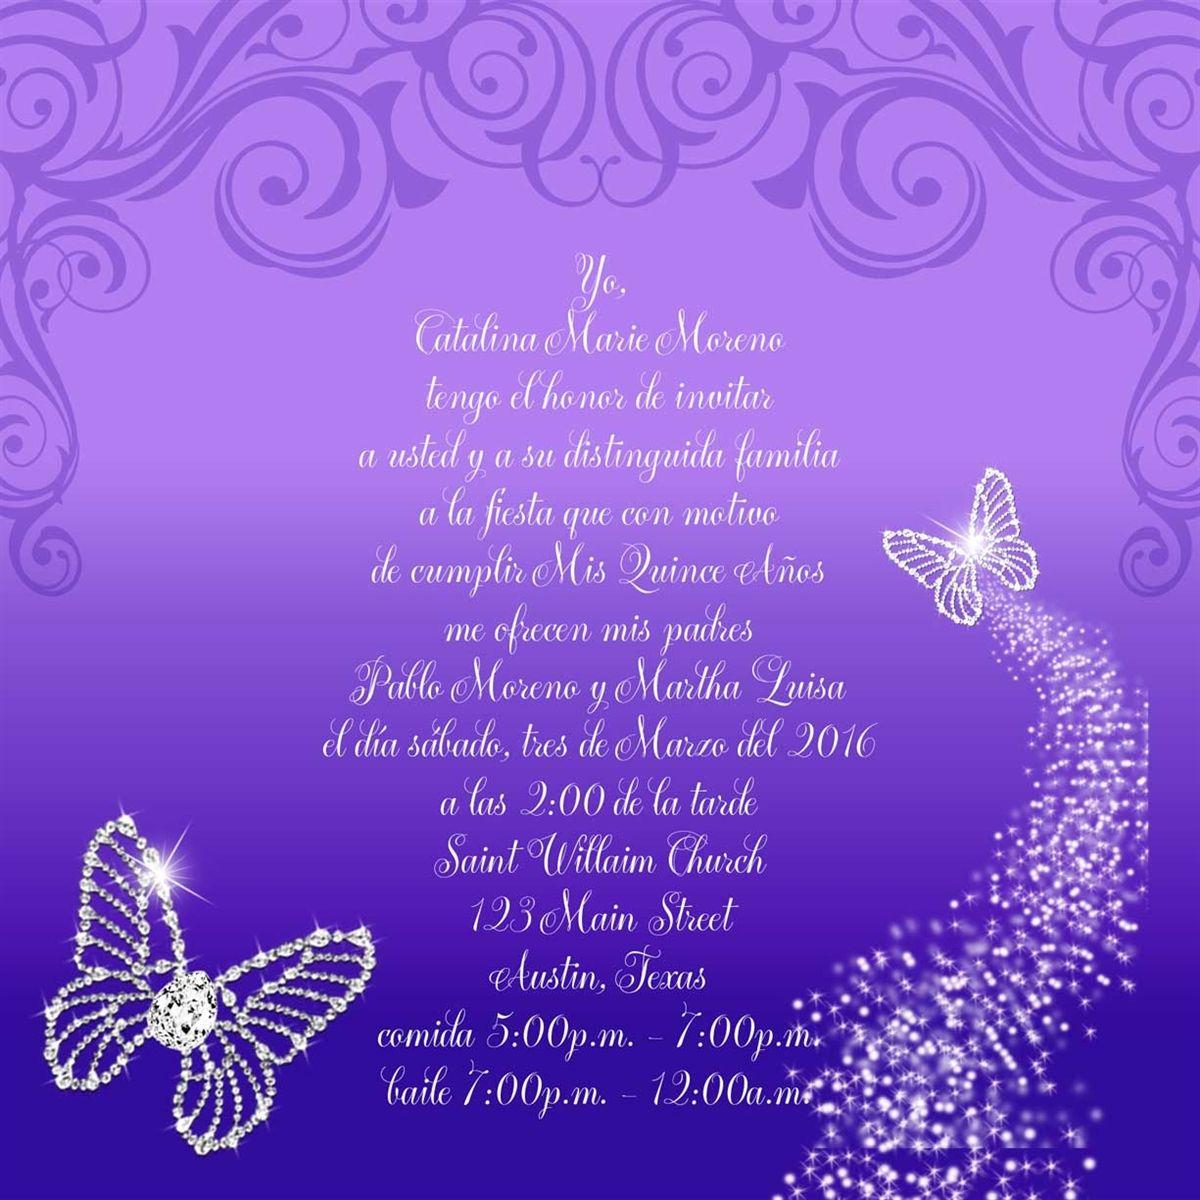 Bling butterflies quince invitation quinceanera invitations and bling butterflies quince invitation stopboris Choice Image